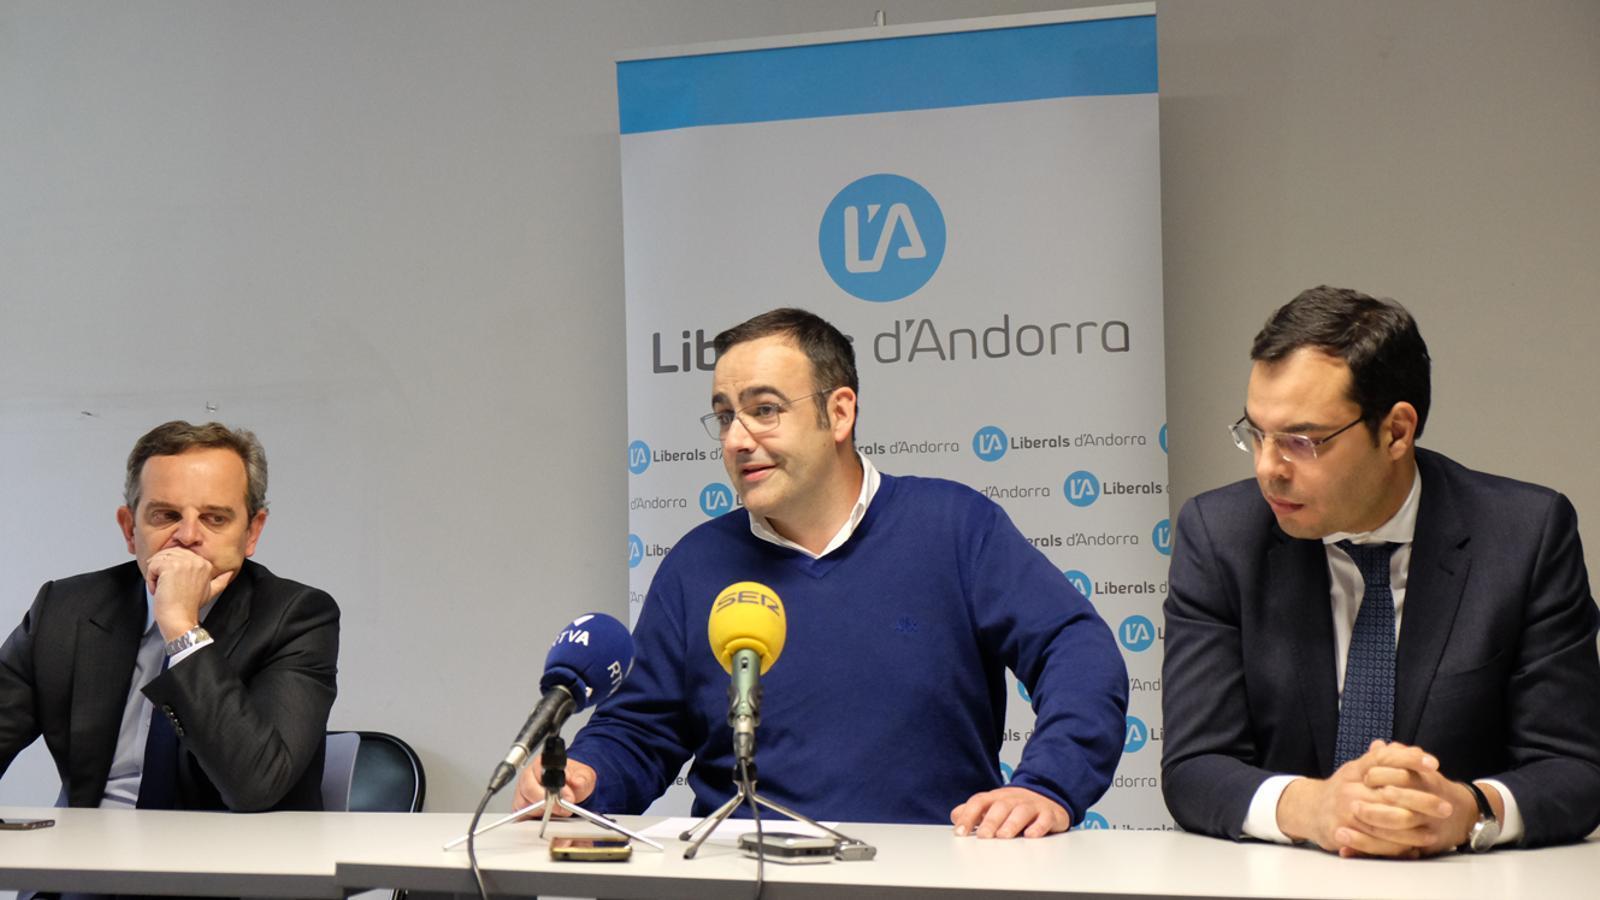 Valentí Martí, Amadeu Rossell i Manaan Aouraghe en roda de premsa. / M. T.